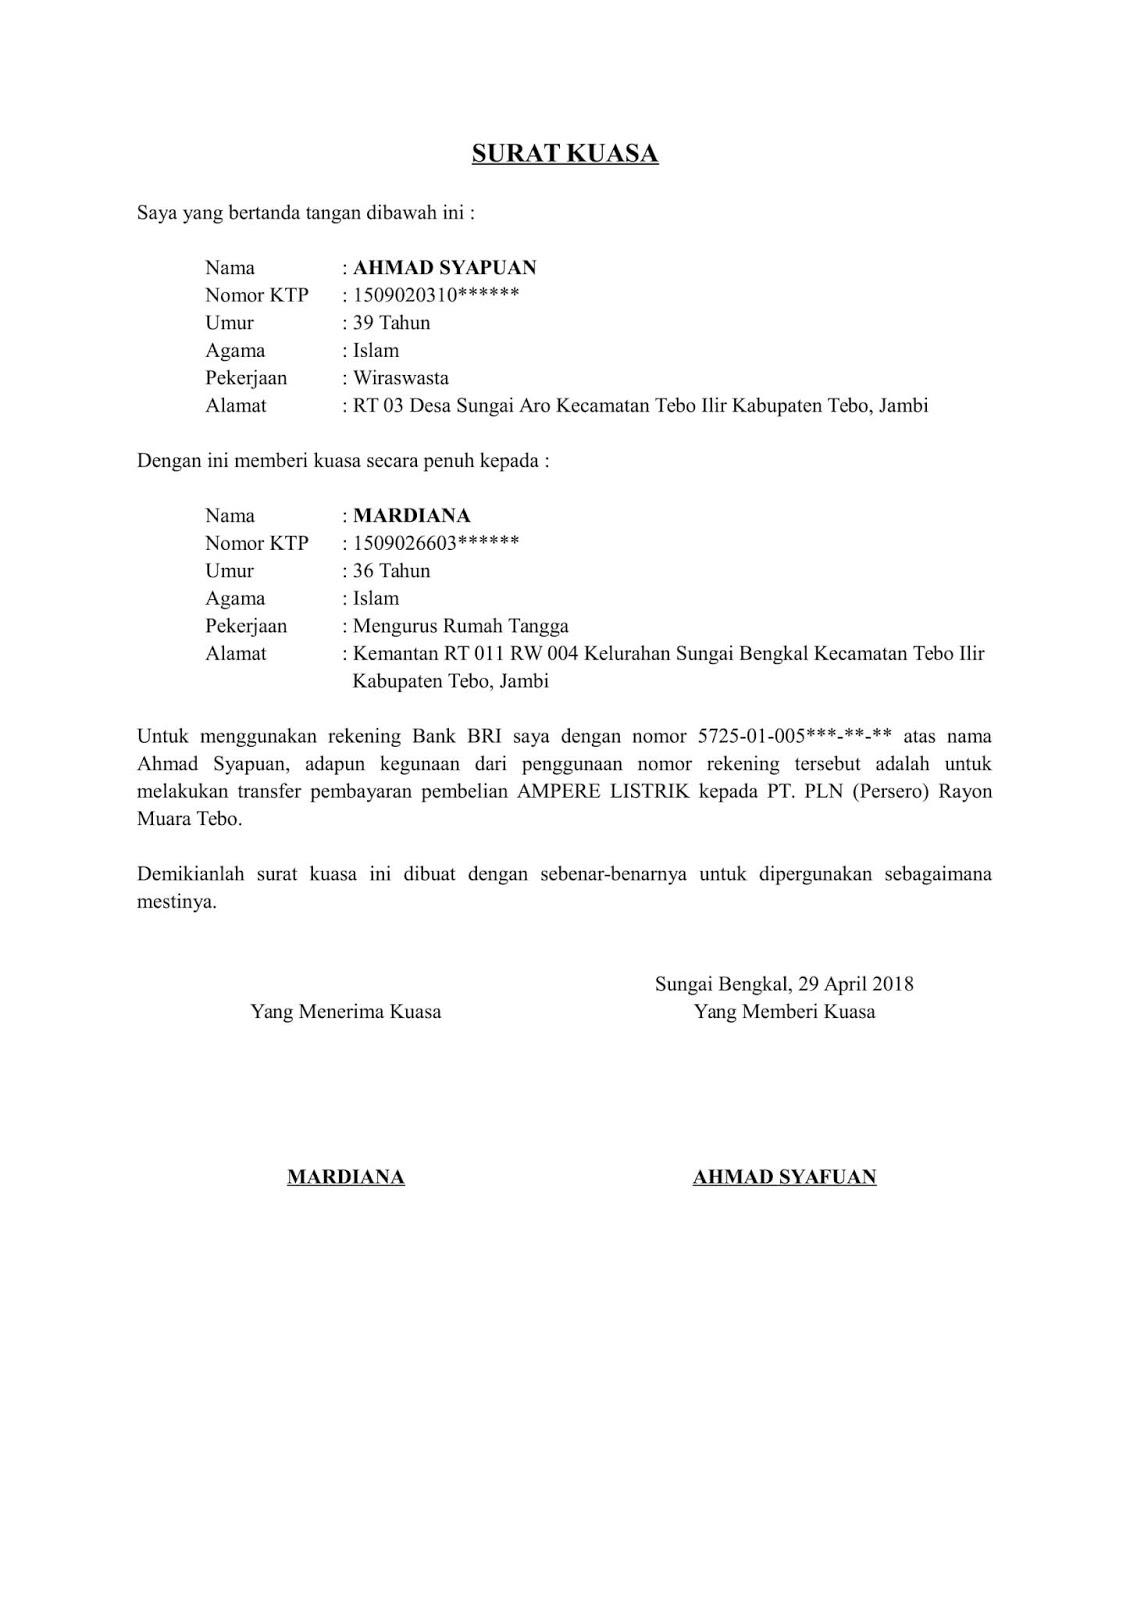 contoh surat orton contoh surat kuasa penggunaan nomor rekening bank untuk pembayaran